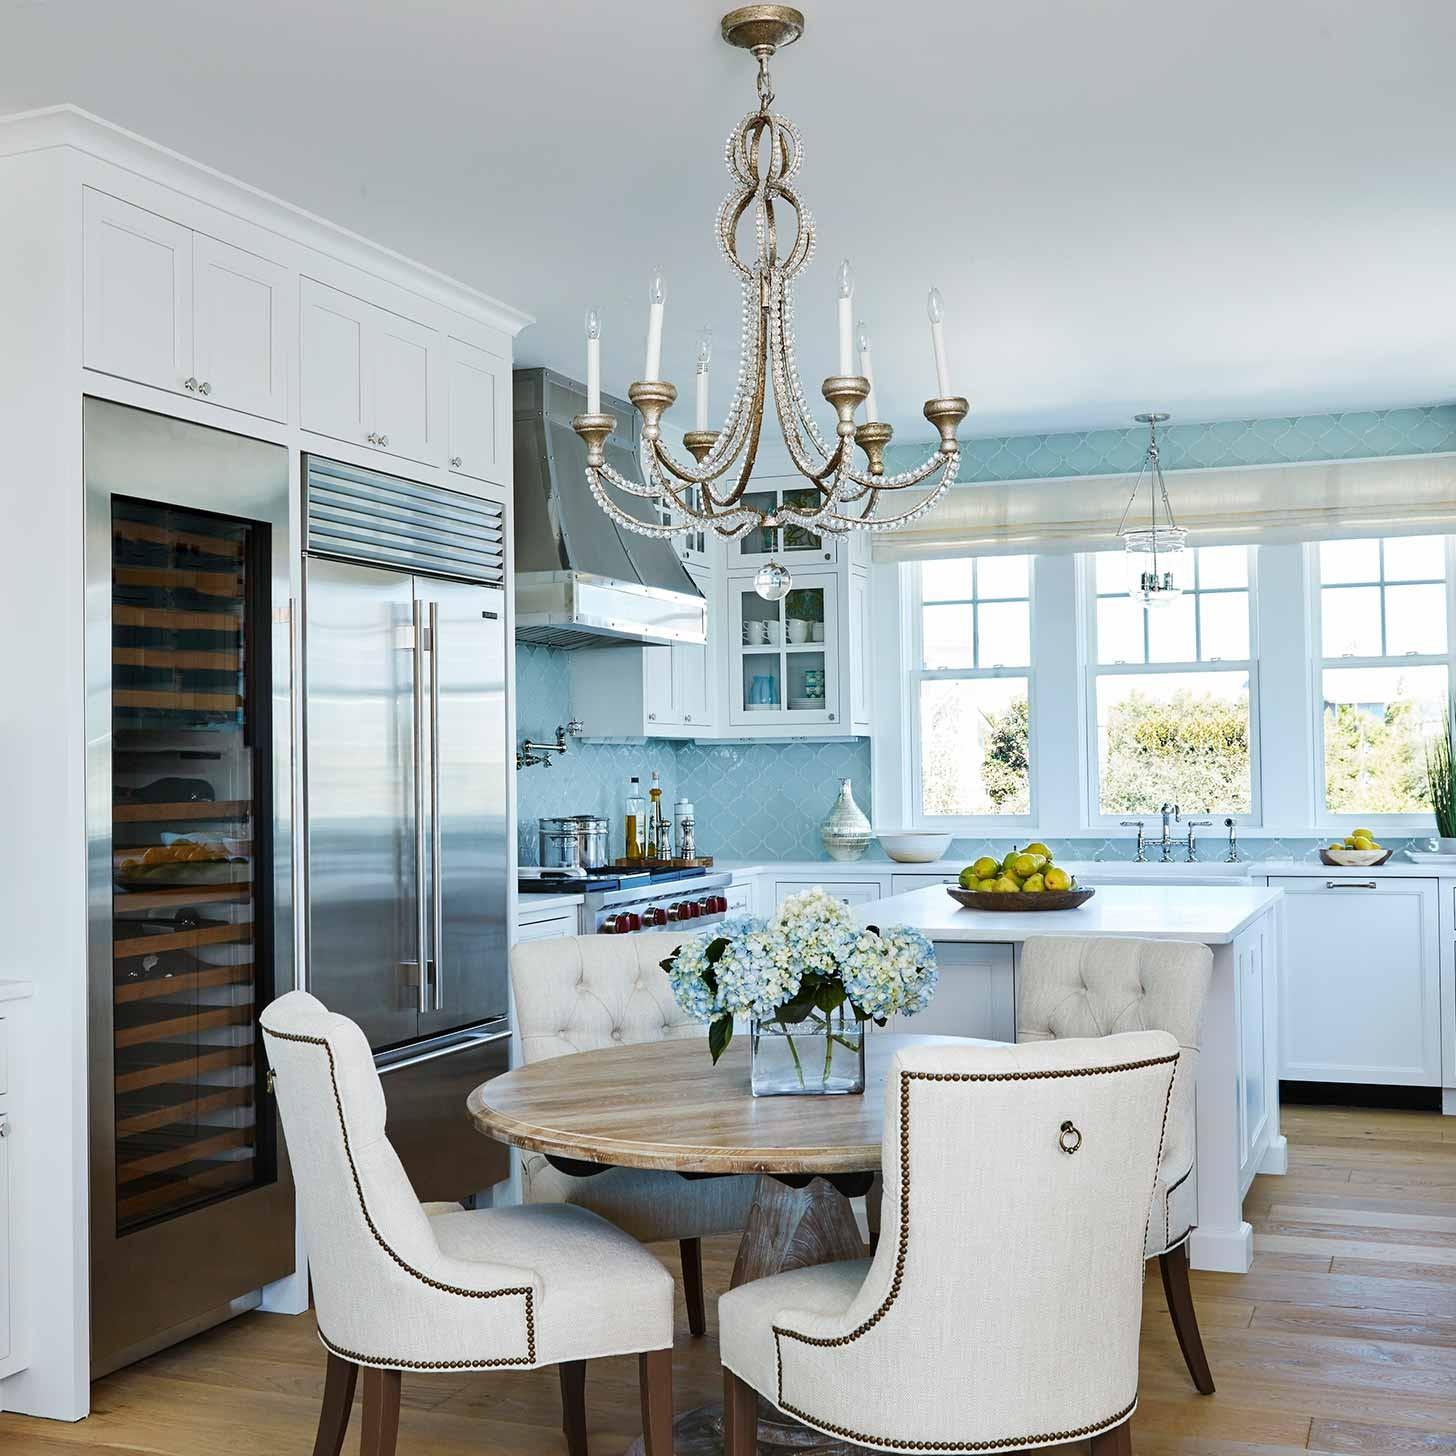 Coastal dining room interior design by Darci Hether New York in Watersound beach